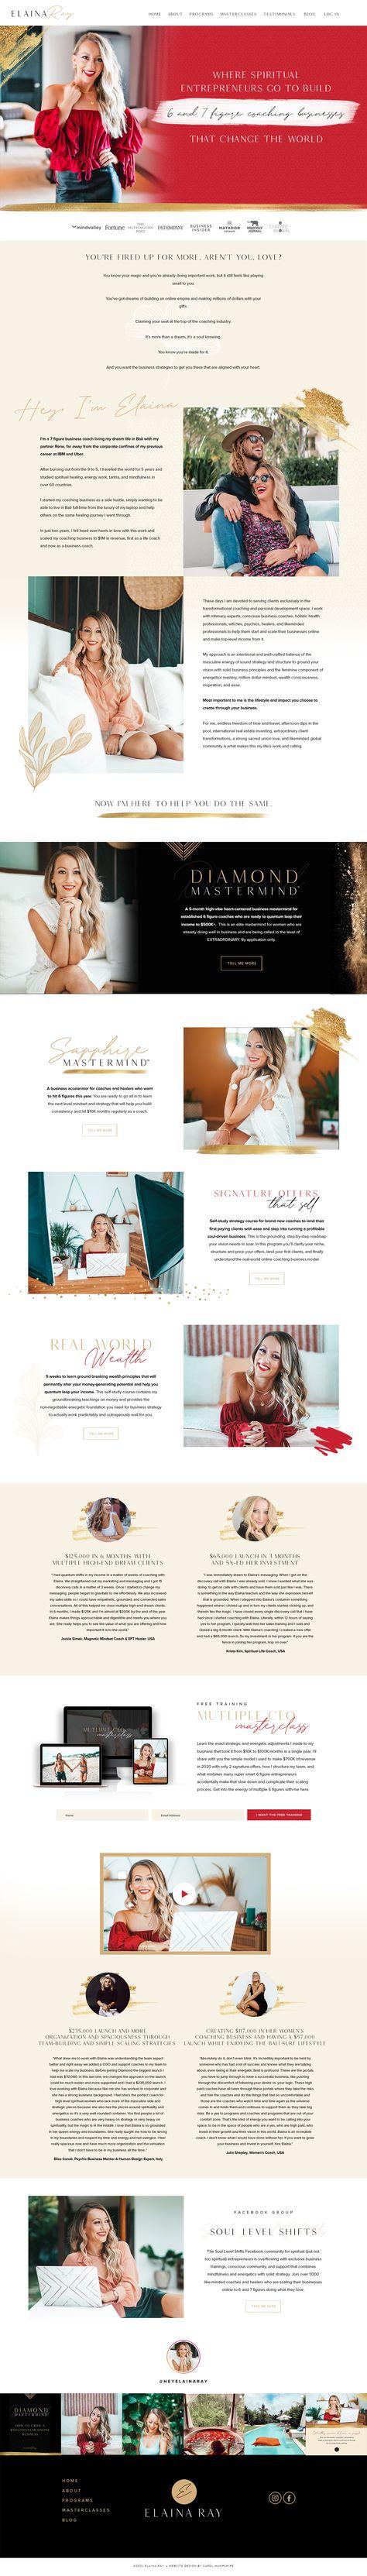 Elaina Ray Web Site